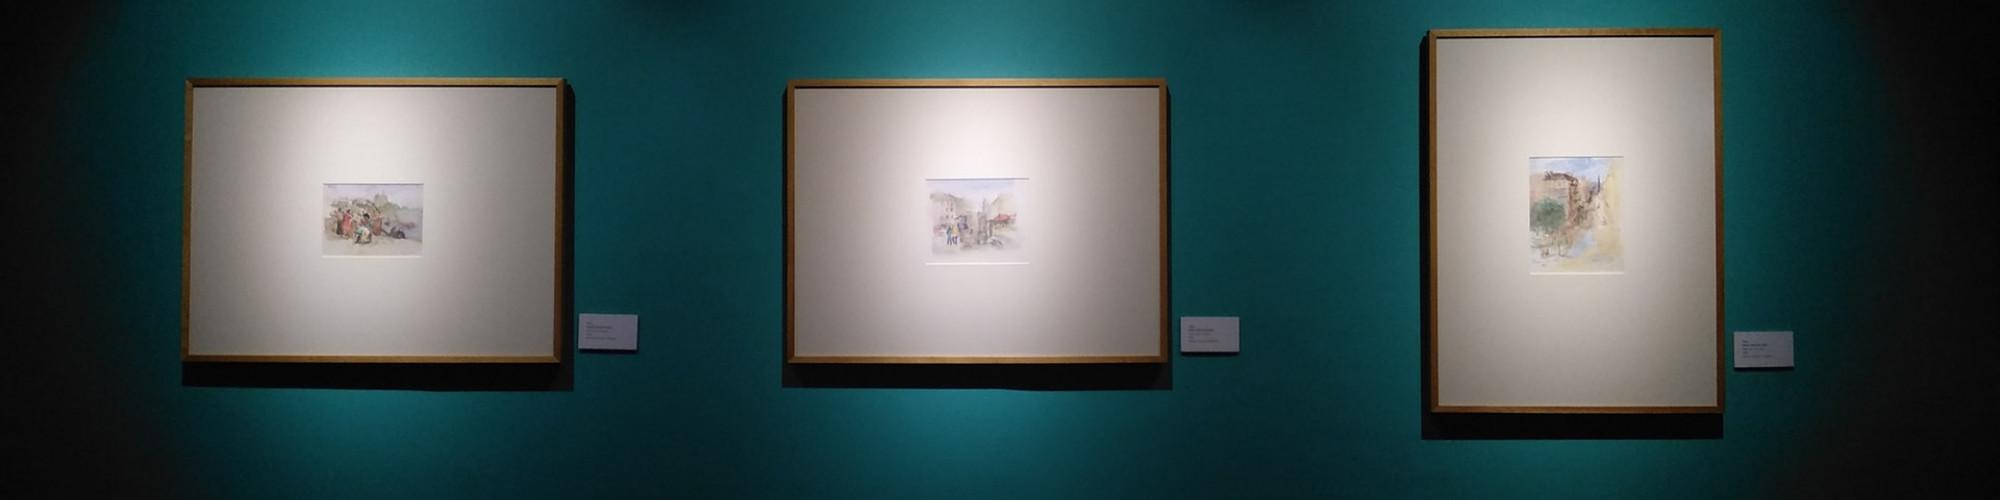 three-paintings-hanging-in-gallery-1674049